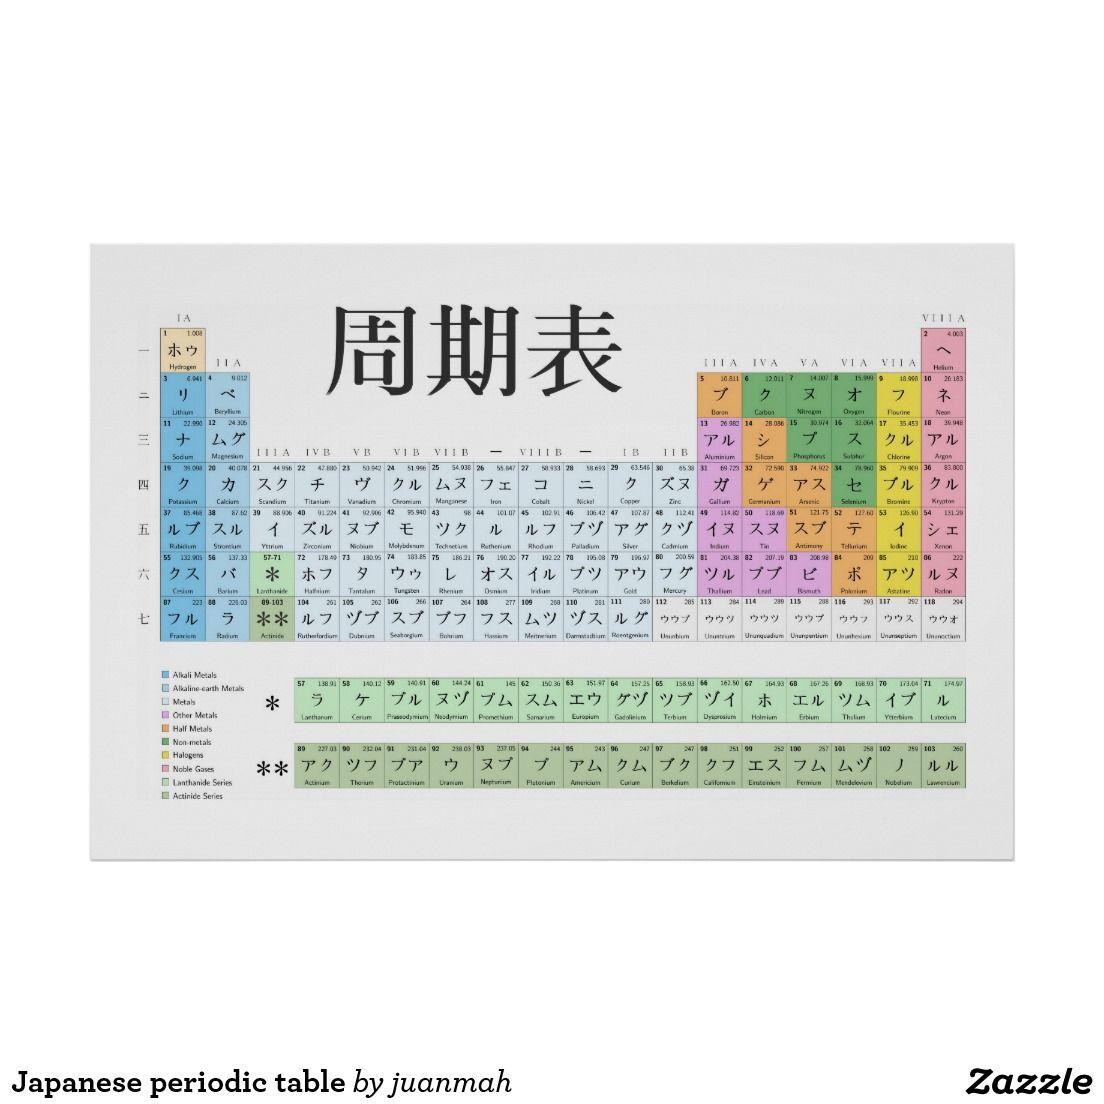 Pster tabla peridica japonesa zazzle pinterest tabla peridica japonesa urtaz Image collections